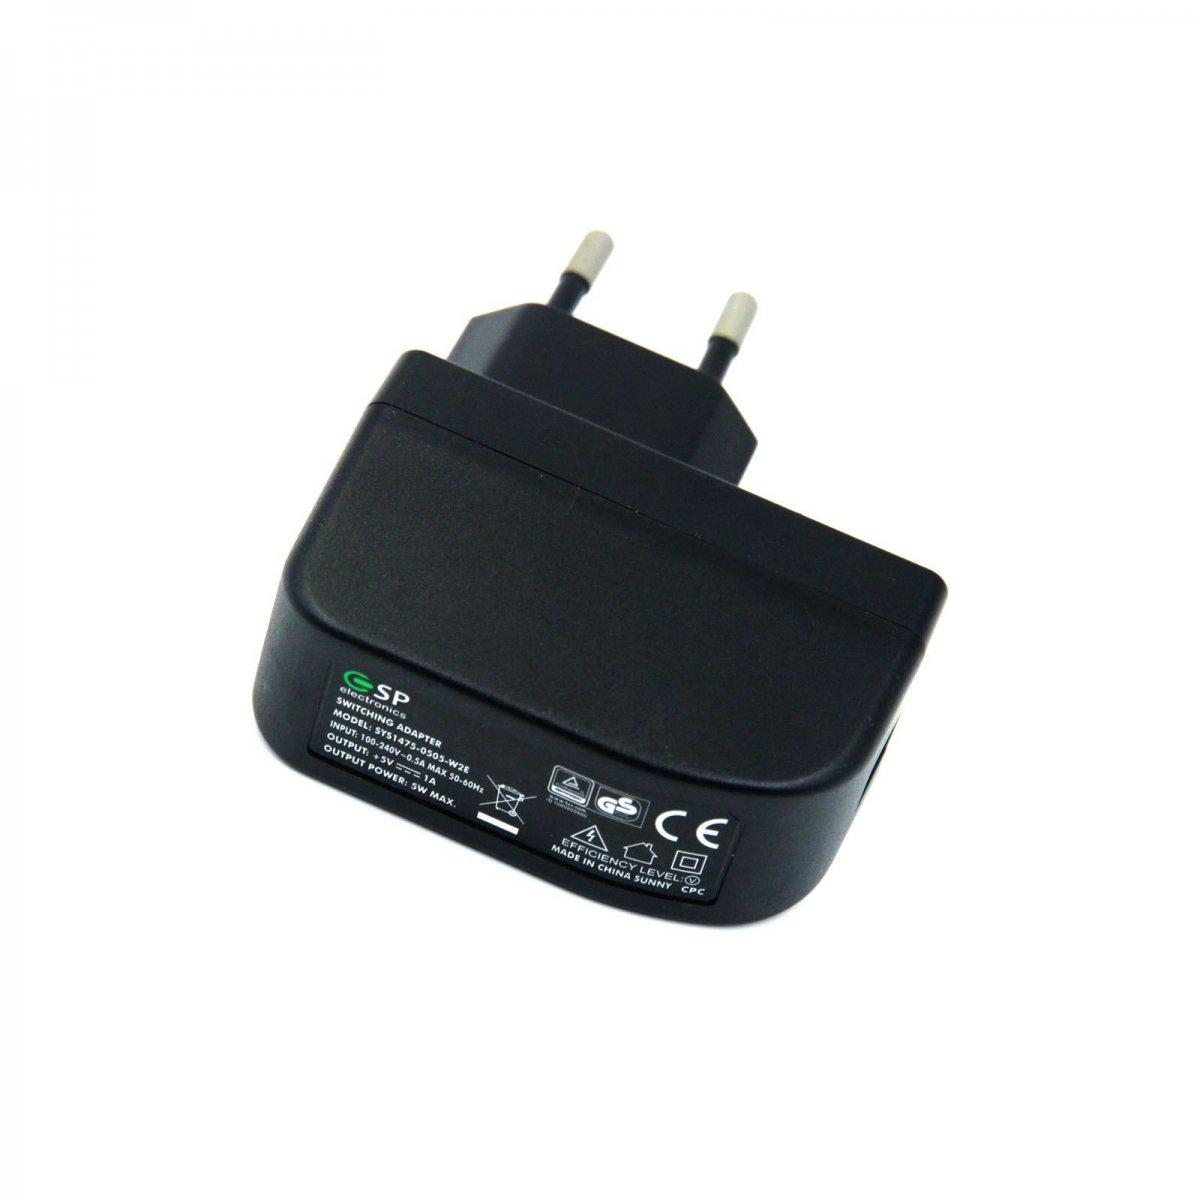 Iphone 5 trådlösa hörlurar